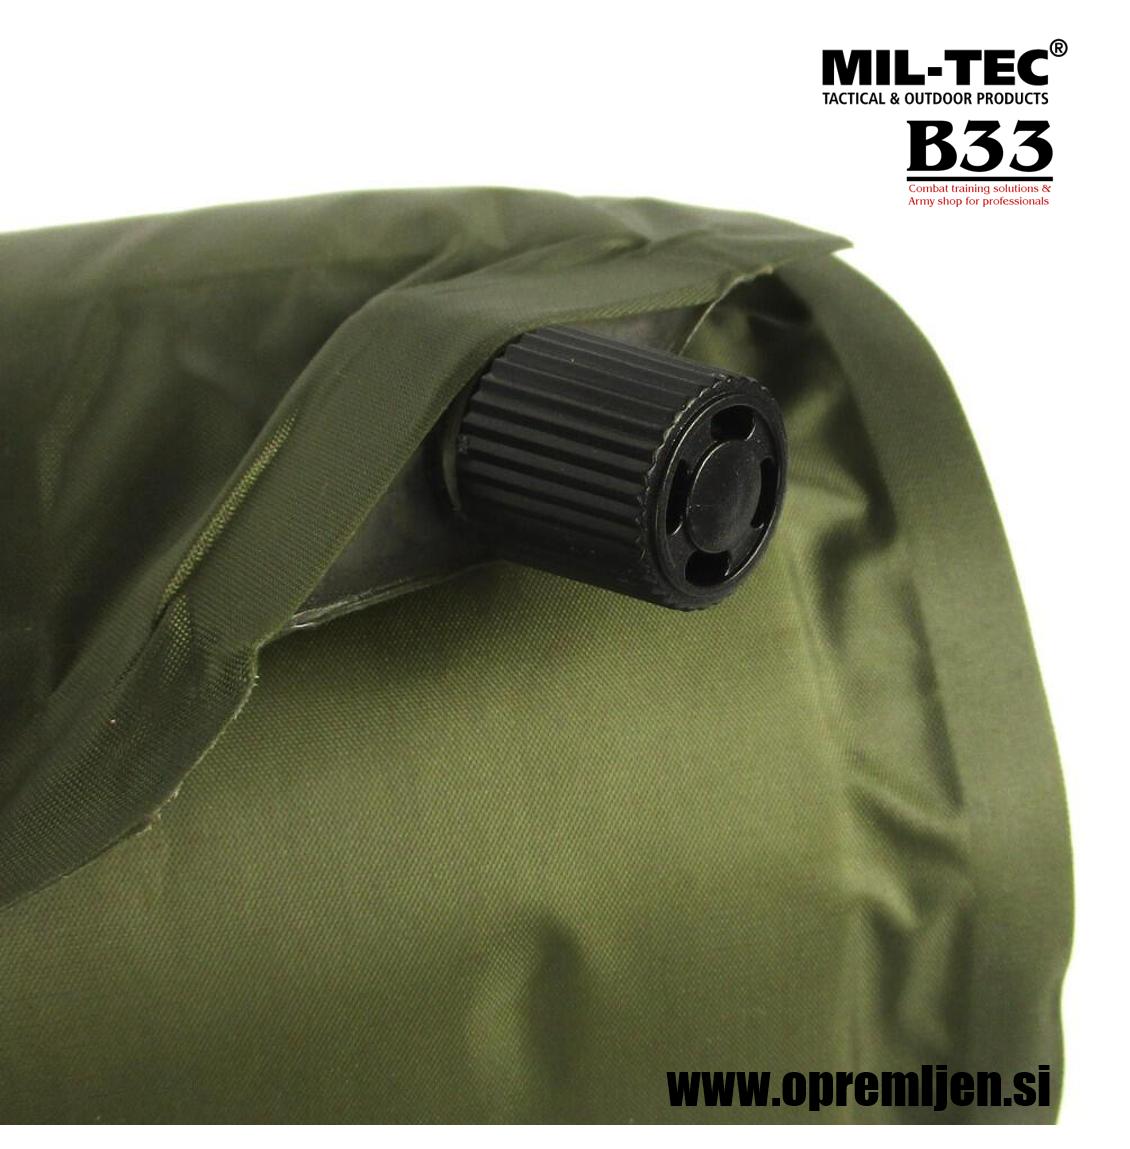 B33 army shop - Vojaška samonapihljiva podloga olivne barve MILTEC by B33 army shop at www.opremljen.si trgovina z vojaško opremo, vojaška trgovina